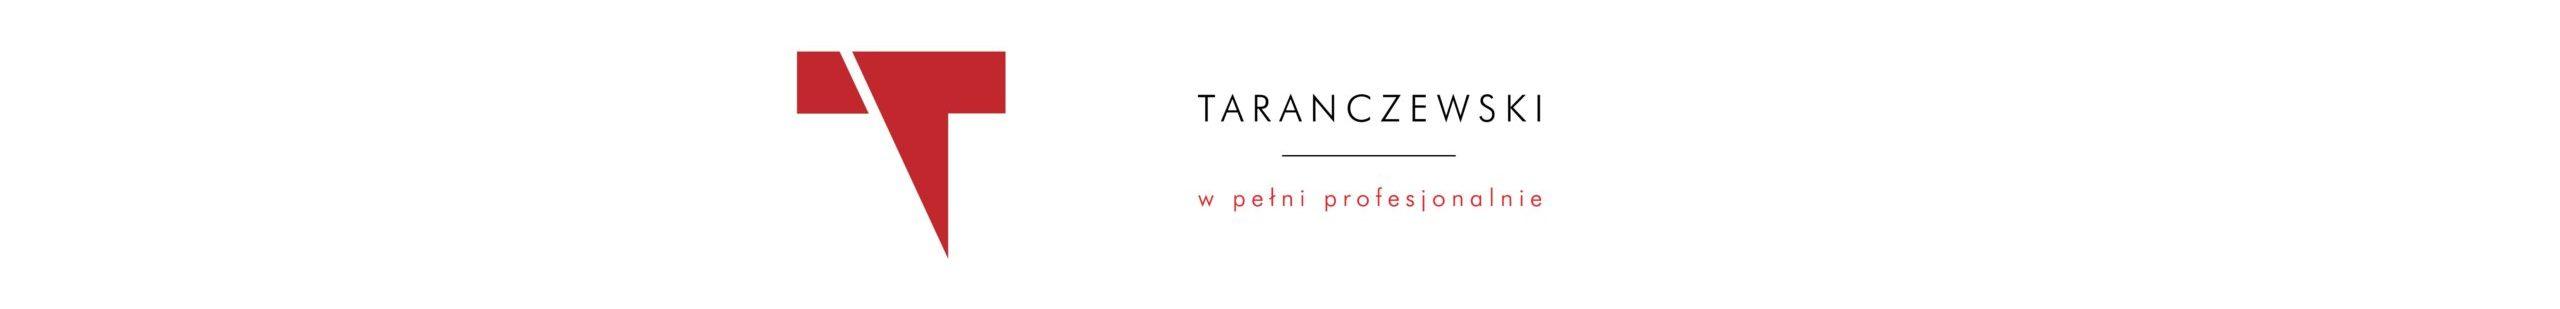 Taranczewski